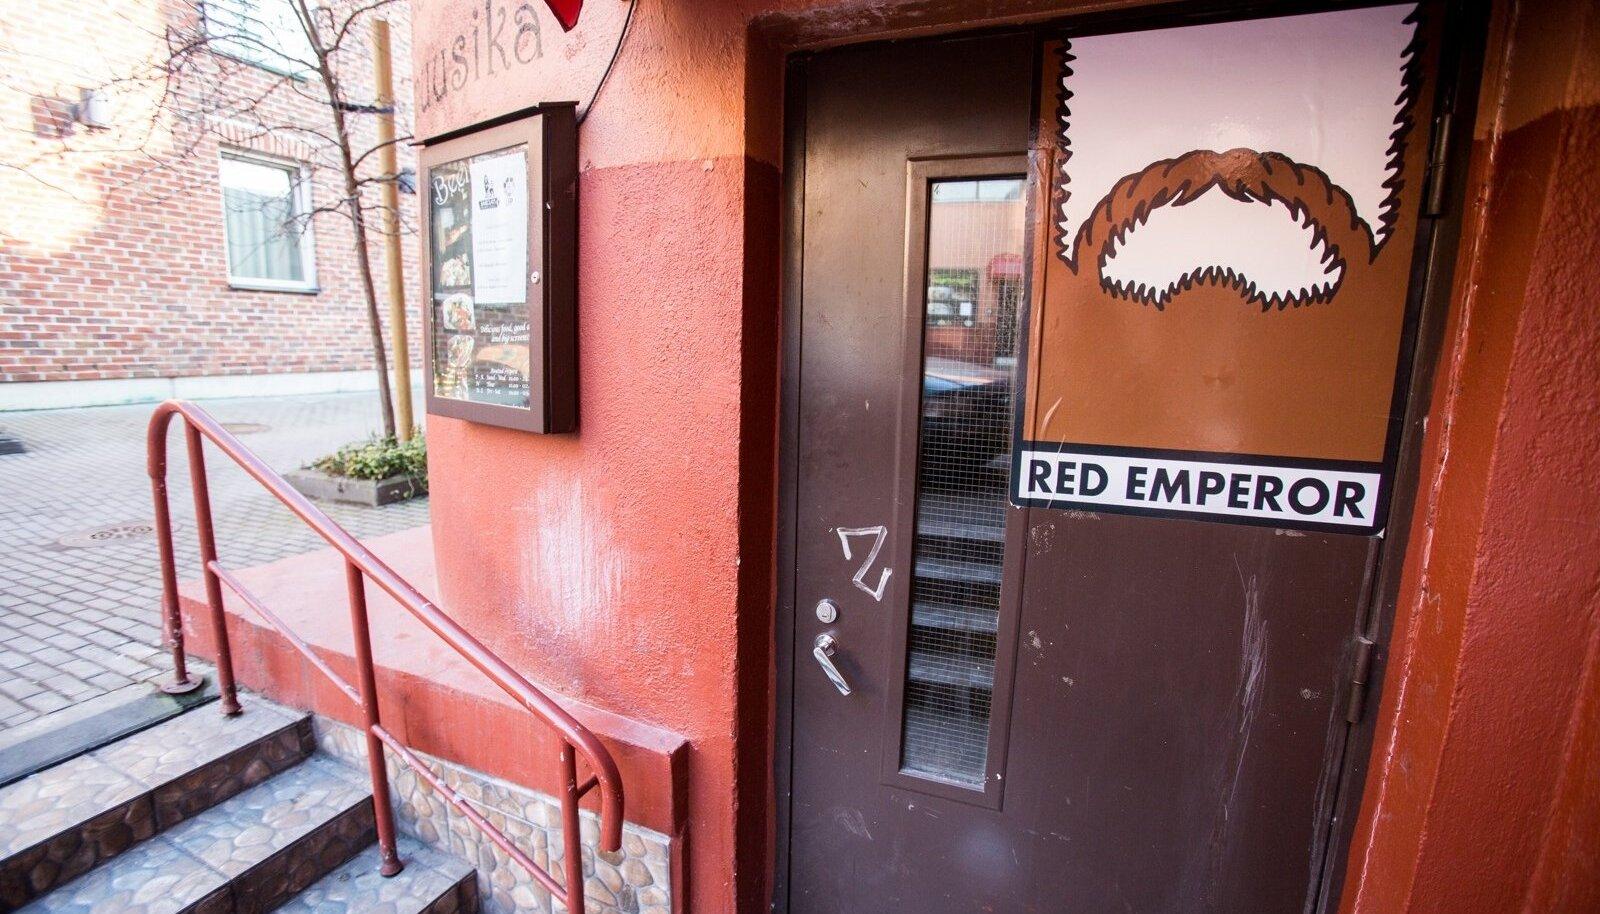 Hostel Red Emperor